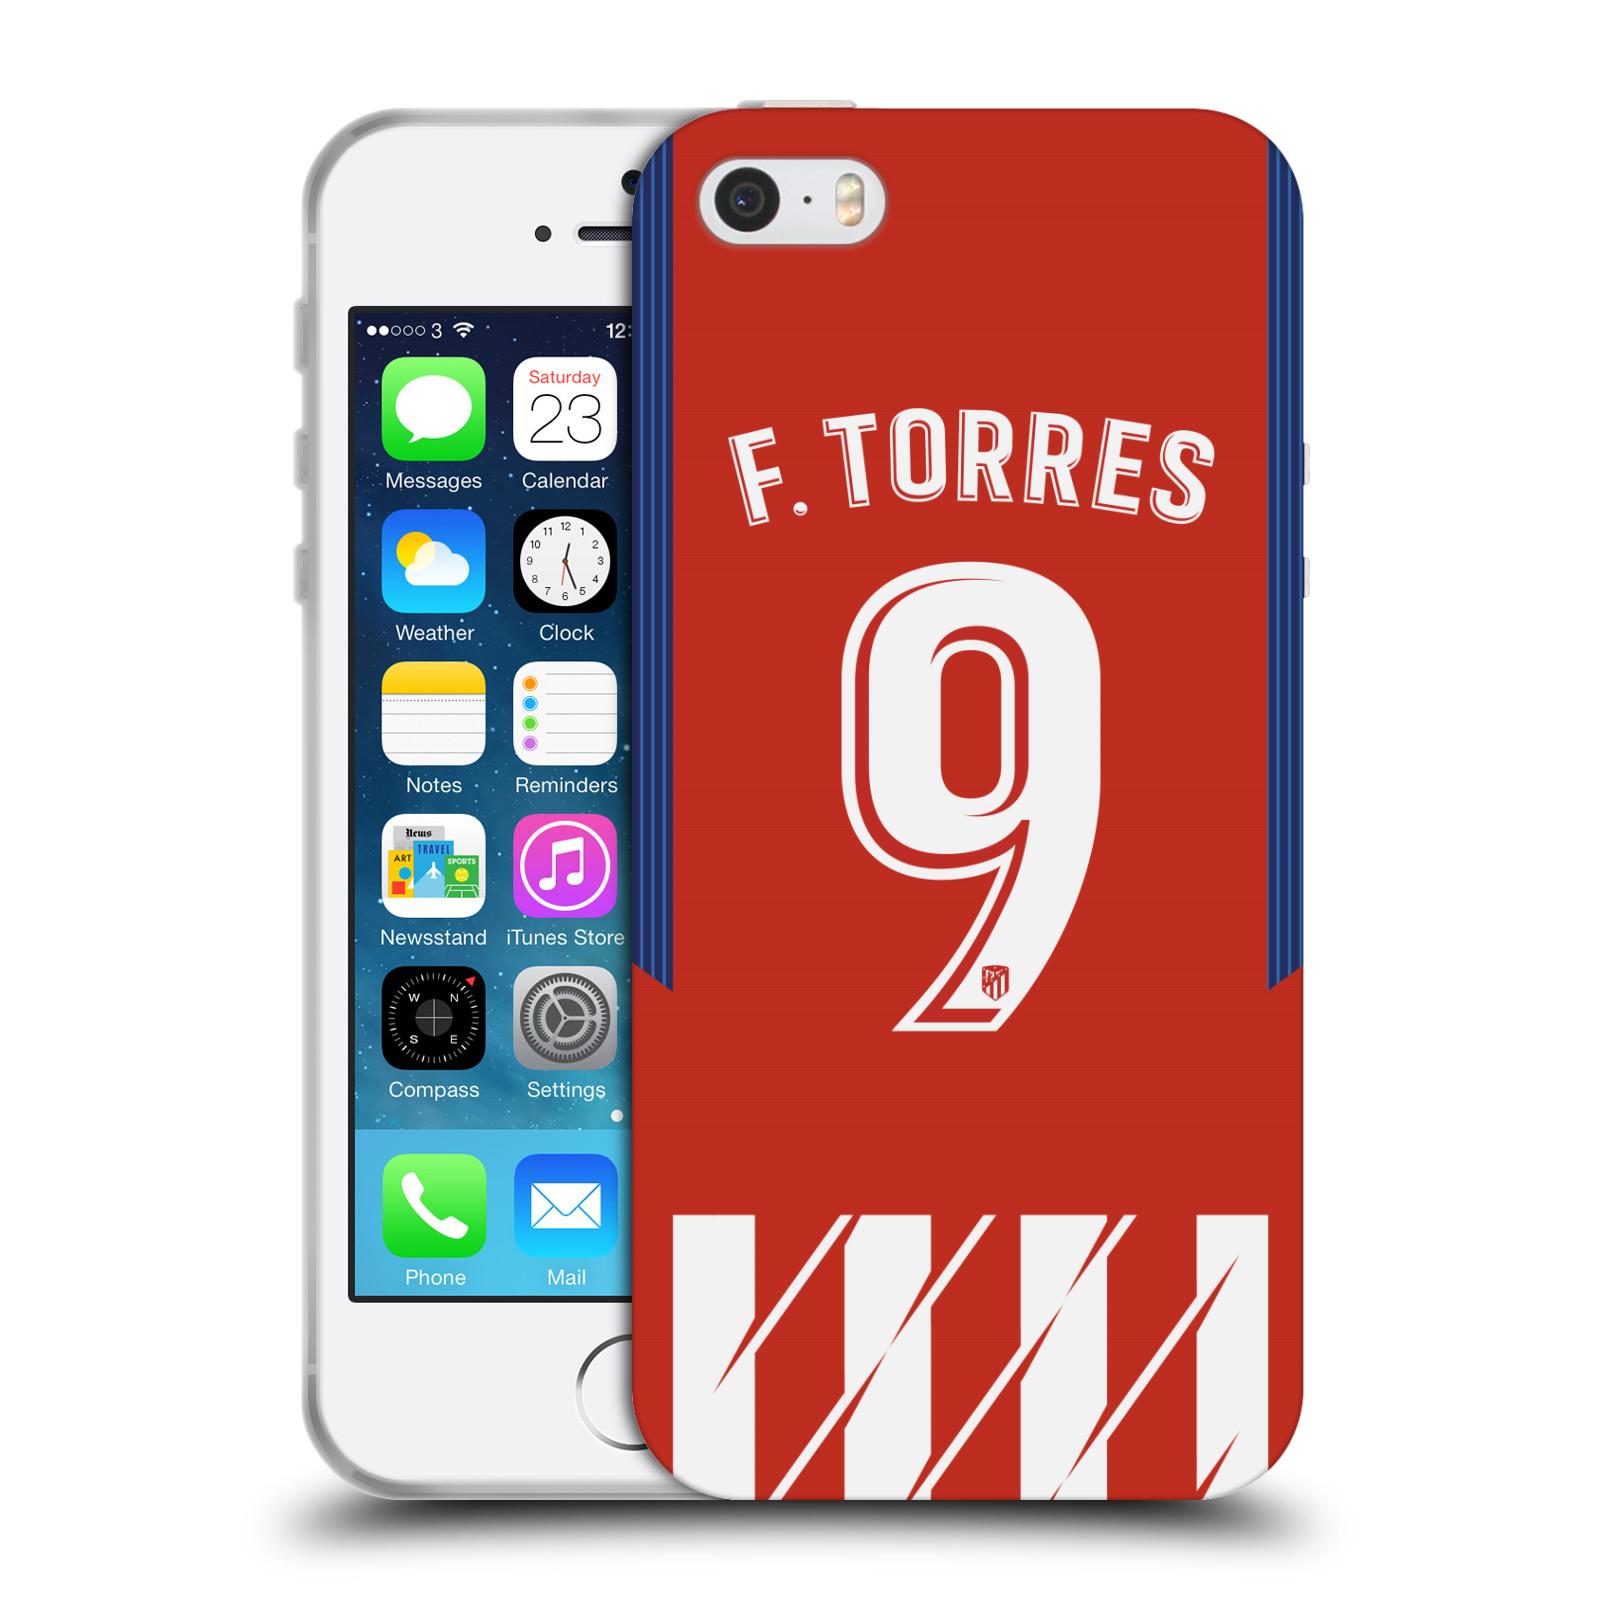 HEAD CASE silikonový obal na mobil Apple Iphone 5/5S Fotbalový klub Atlético Madrid dres Fernando Torres